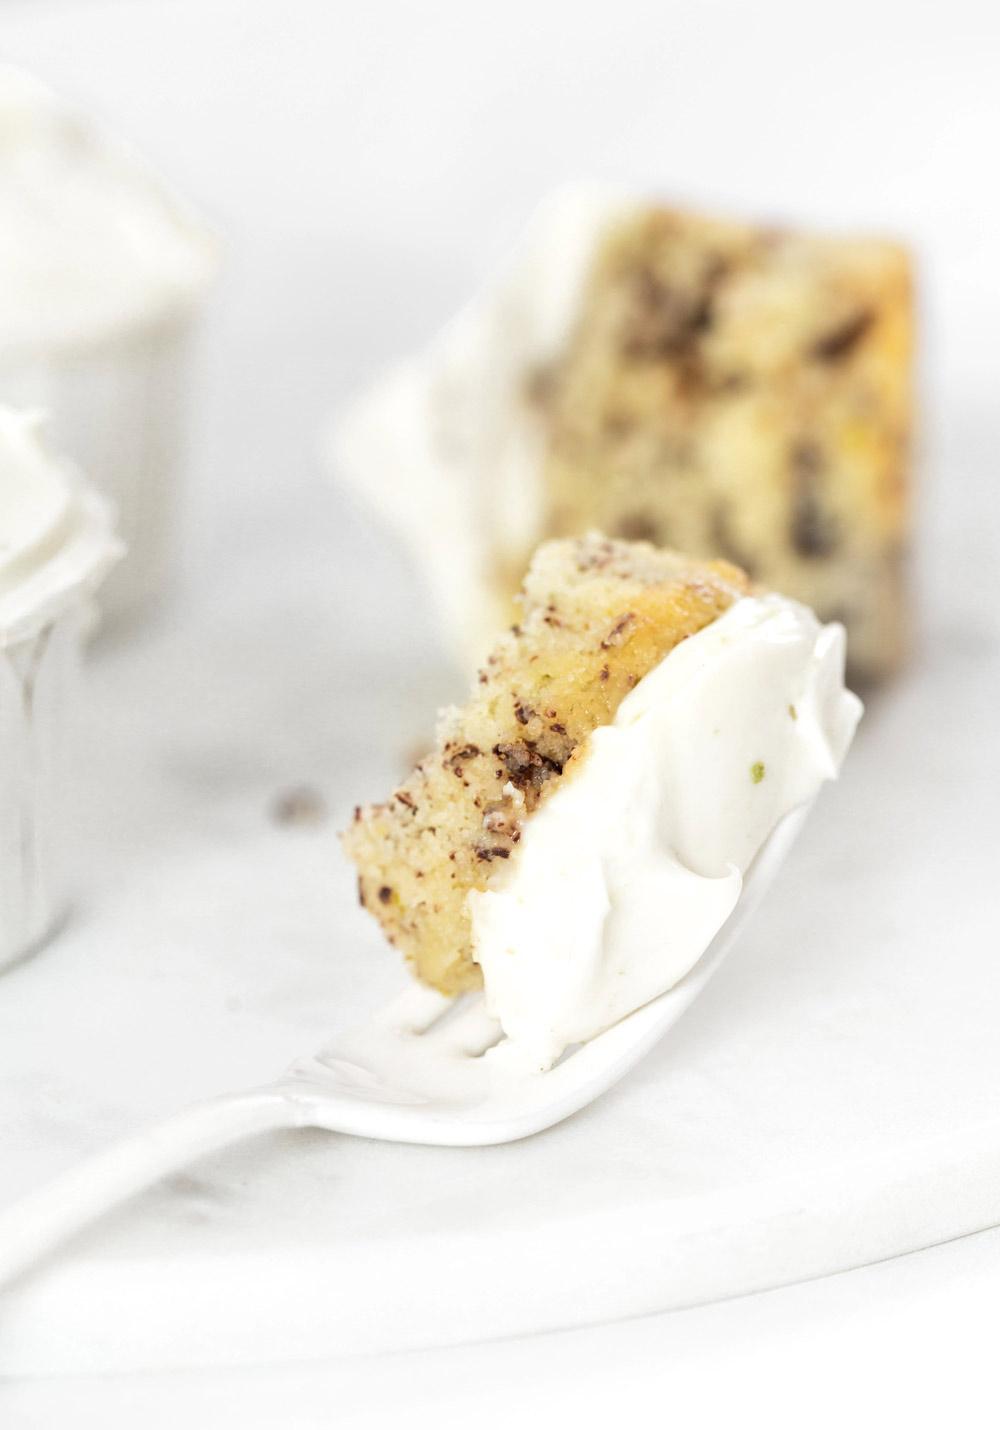 Blanccoco_Photographe_Cupcakes_Lemon_Coconut-7